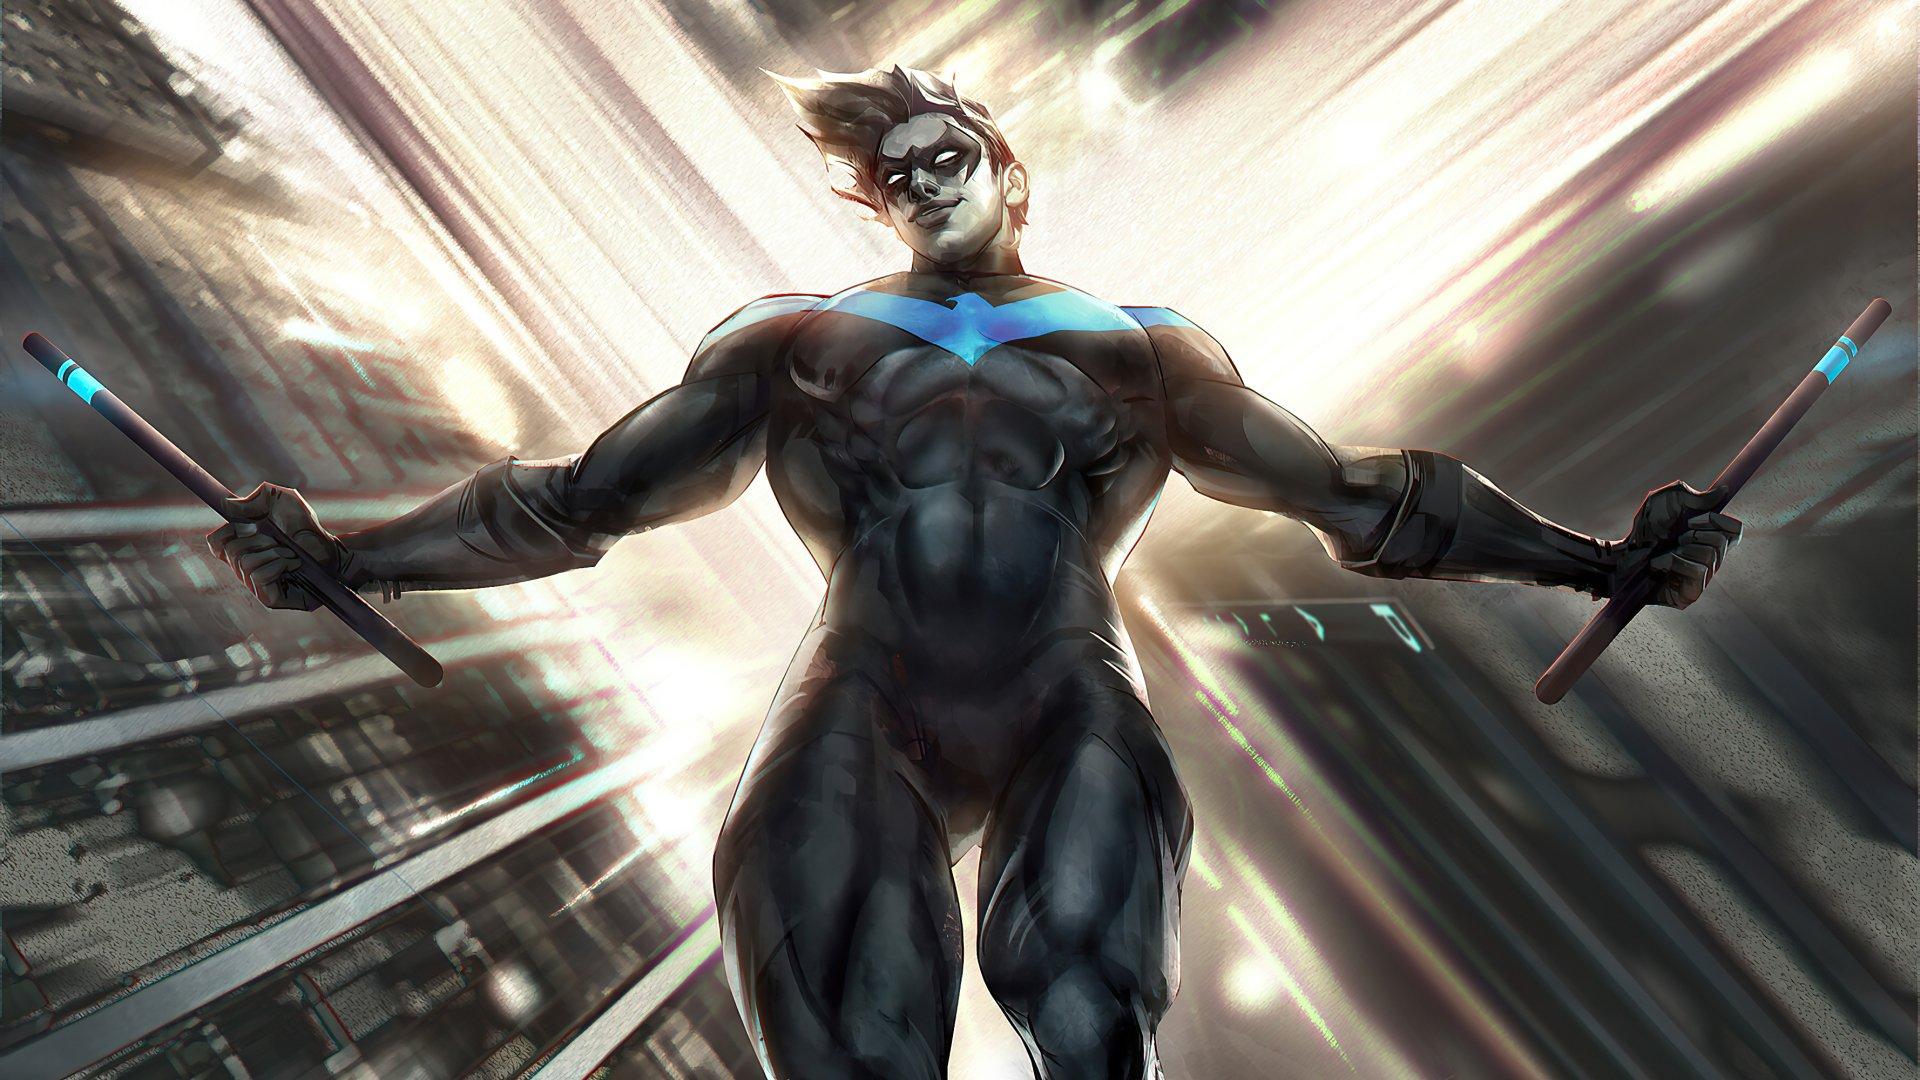 Nightwing 4k Ultra HD Wallpaper | Background Image